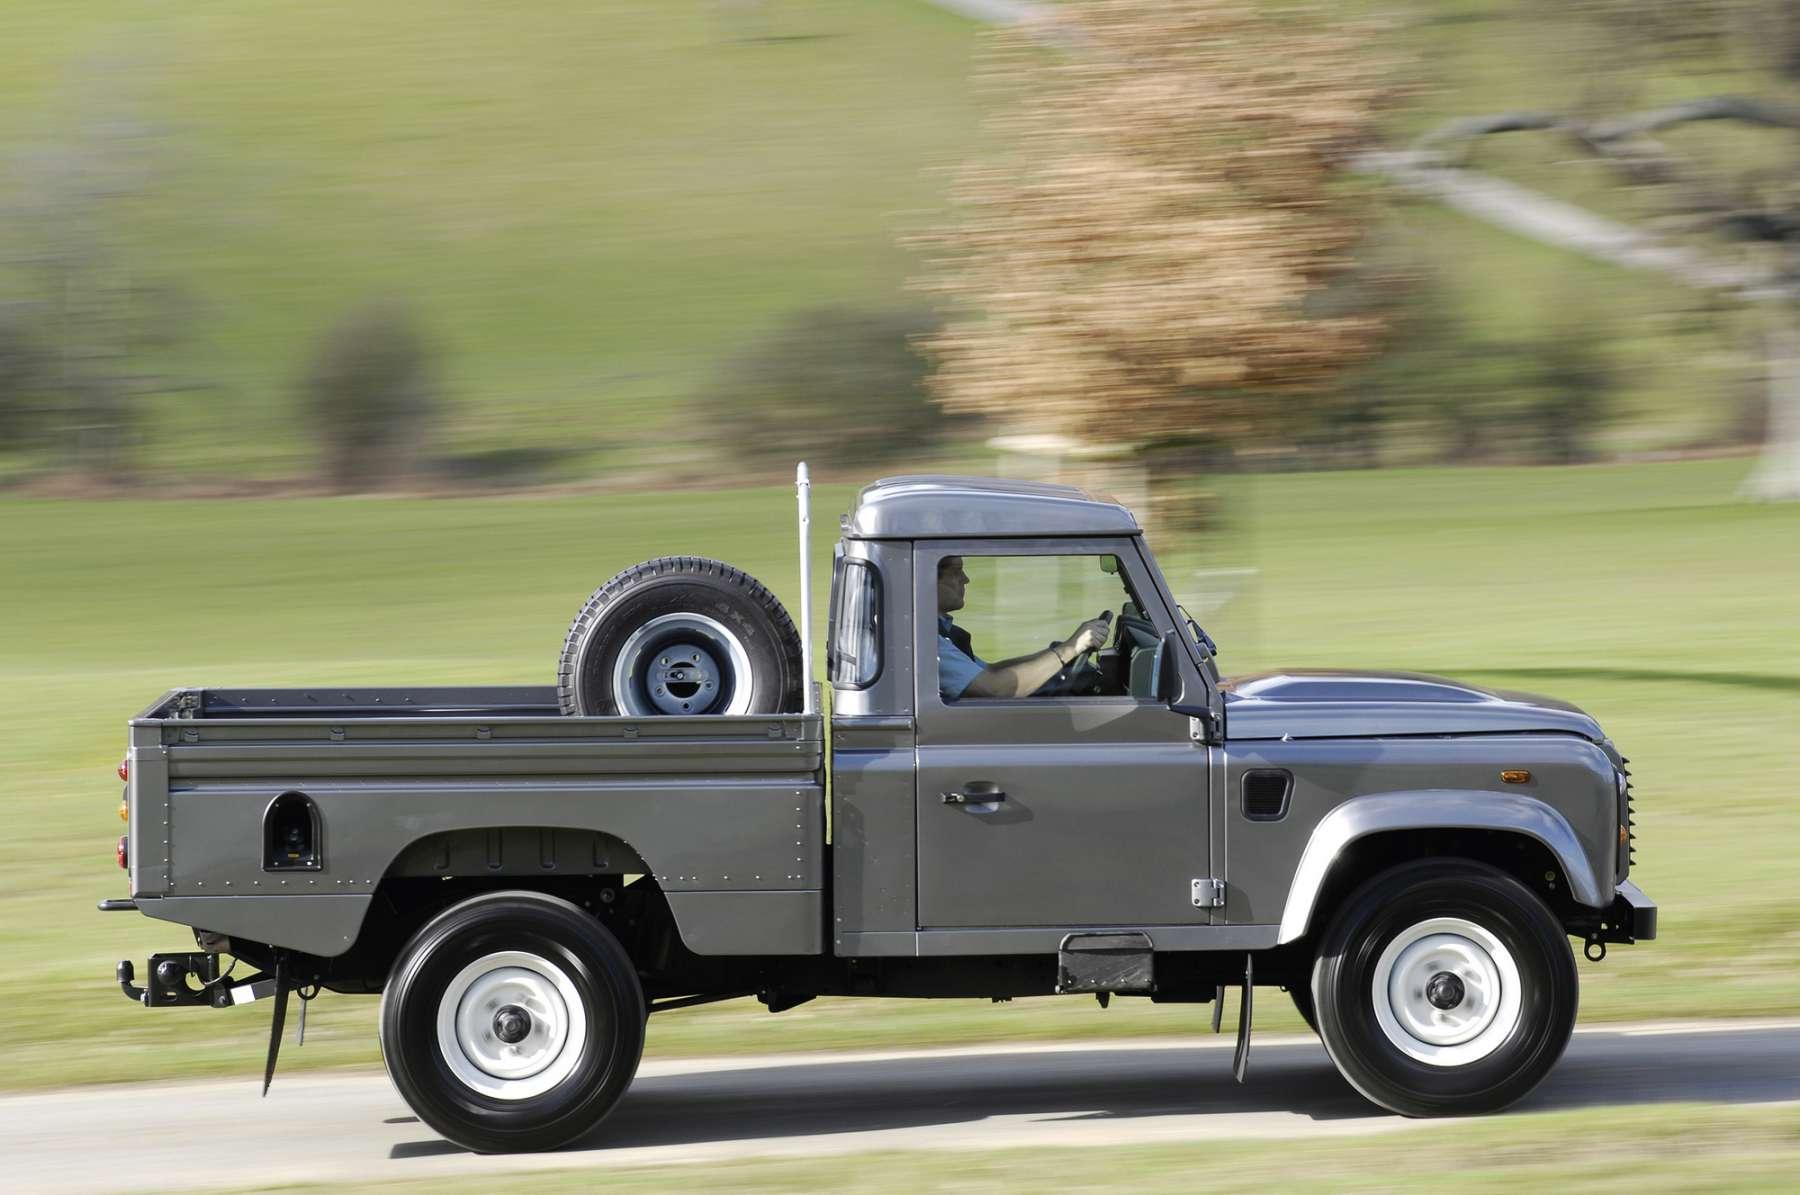 Revell Germany Landrover series III false alarm Truck Kit News